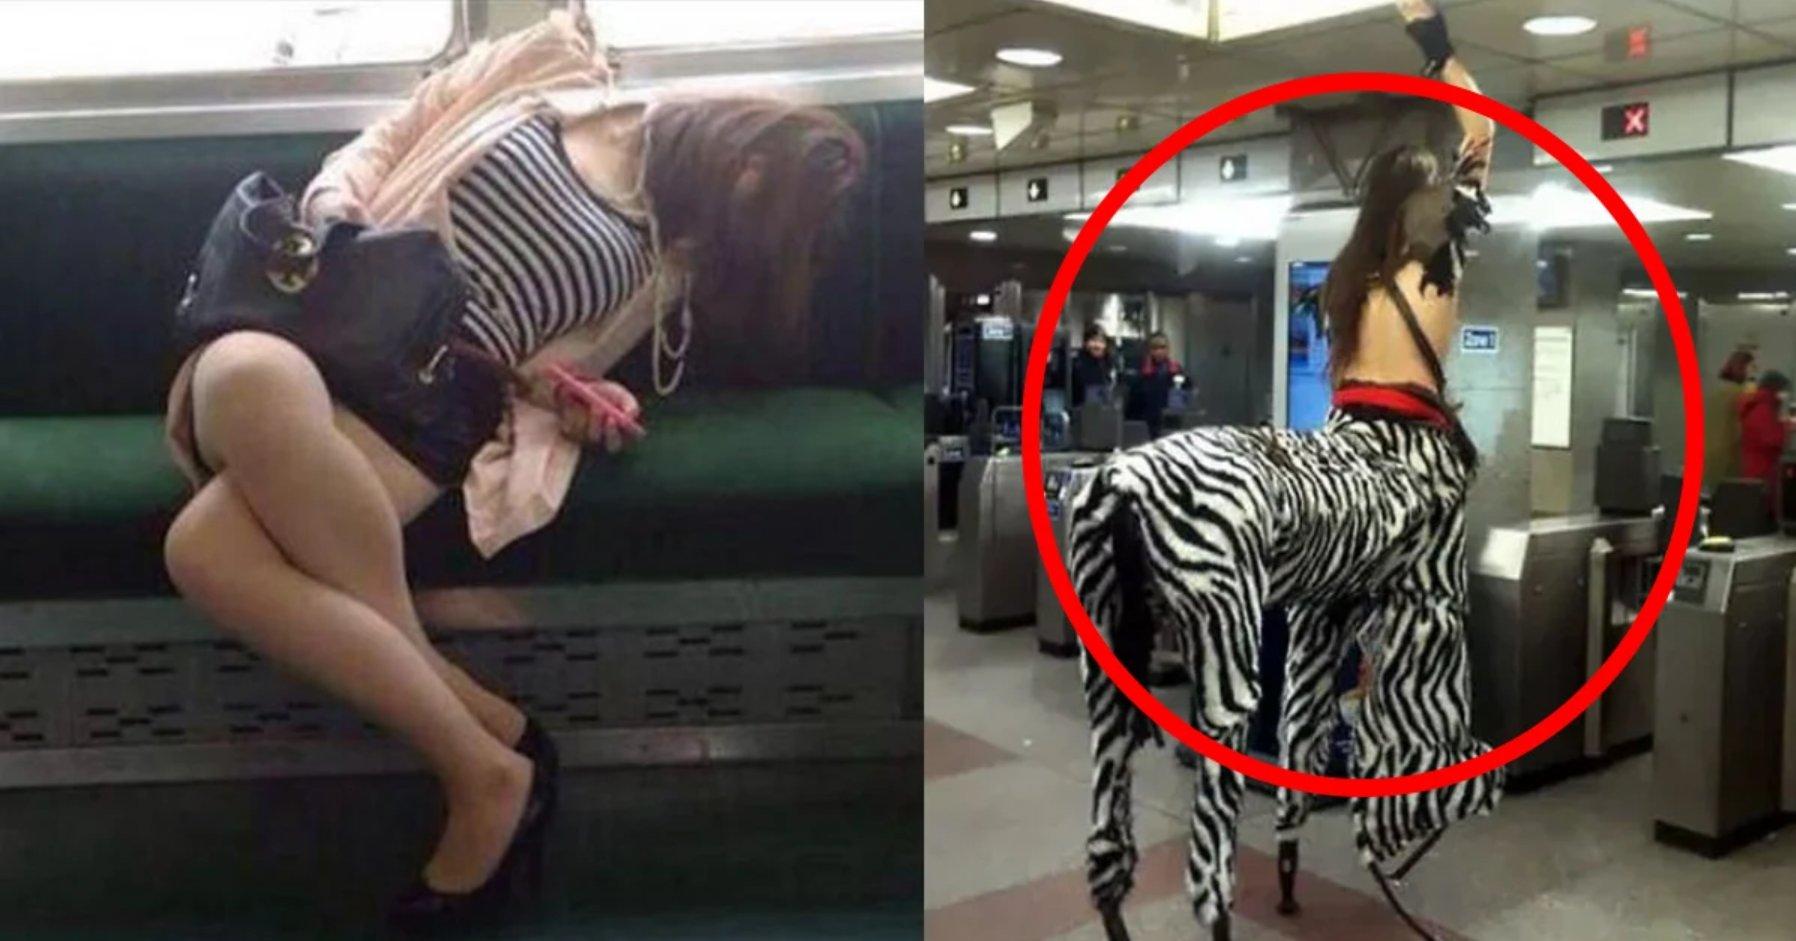 efbc91efbc91.png?resize=300,169 - 【腹筋崩壊】電車の中で偶然に見かけた爆笑光景まとめ!